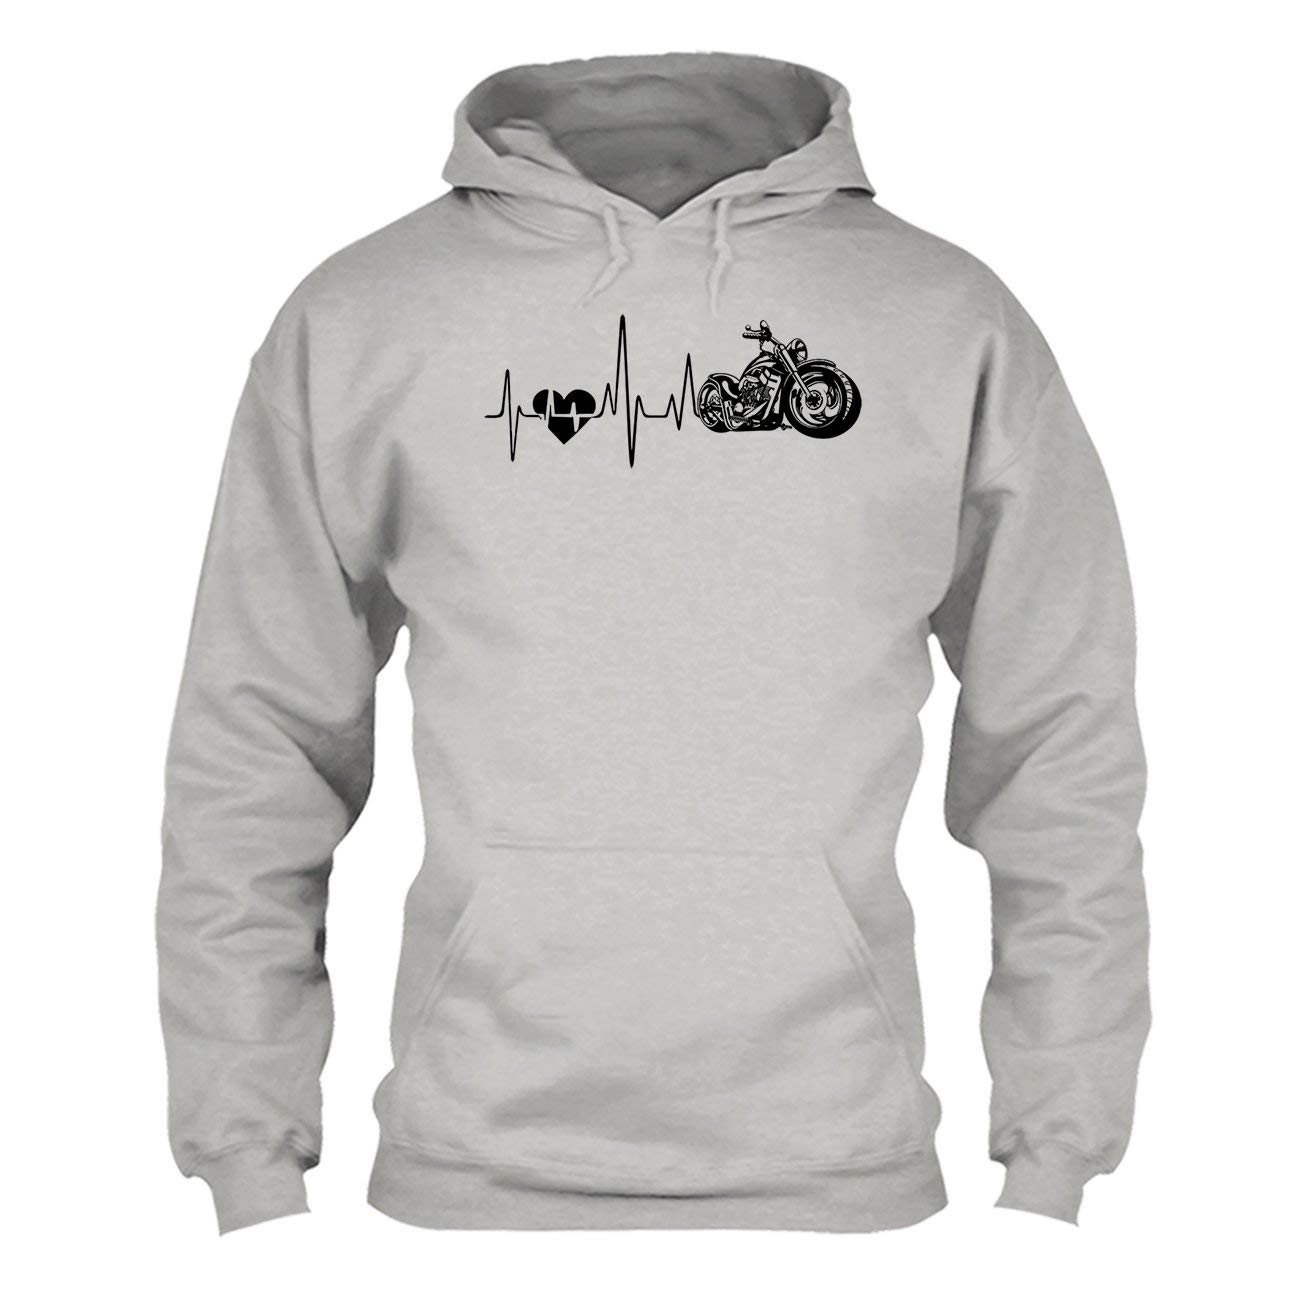 Clothing Tee Shirt Motorcycle Heartbeat Shirt